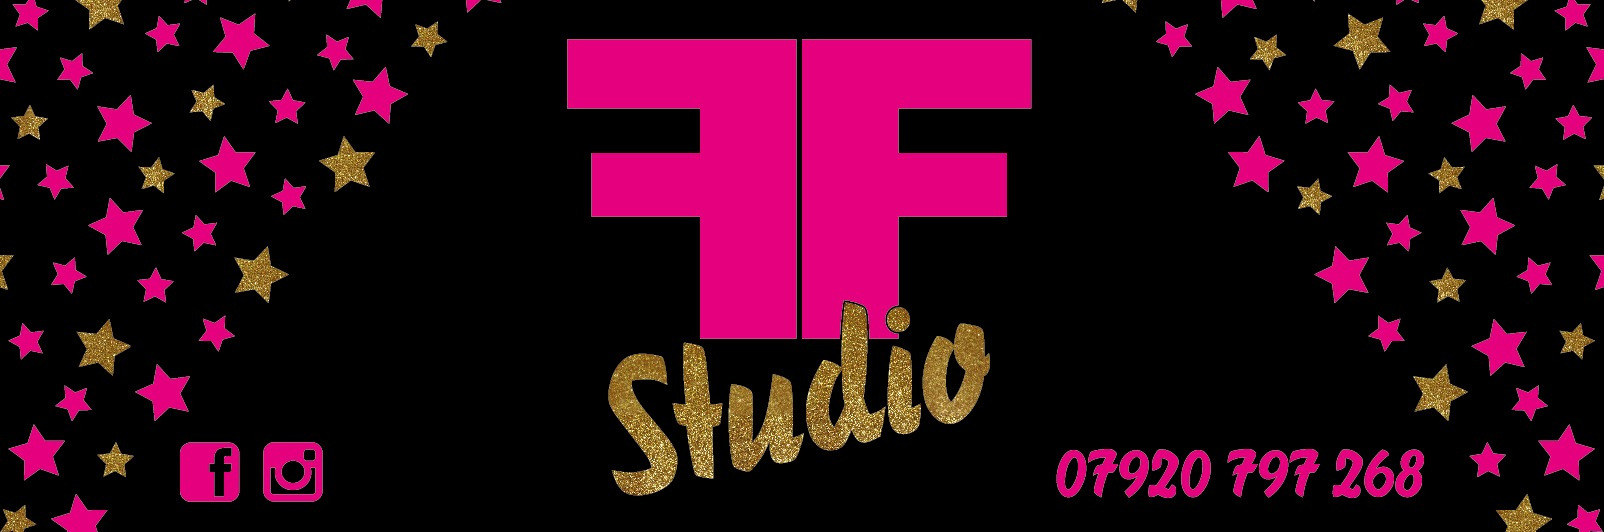 FF Studio.jpeg